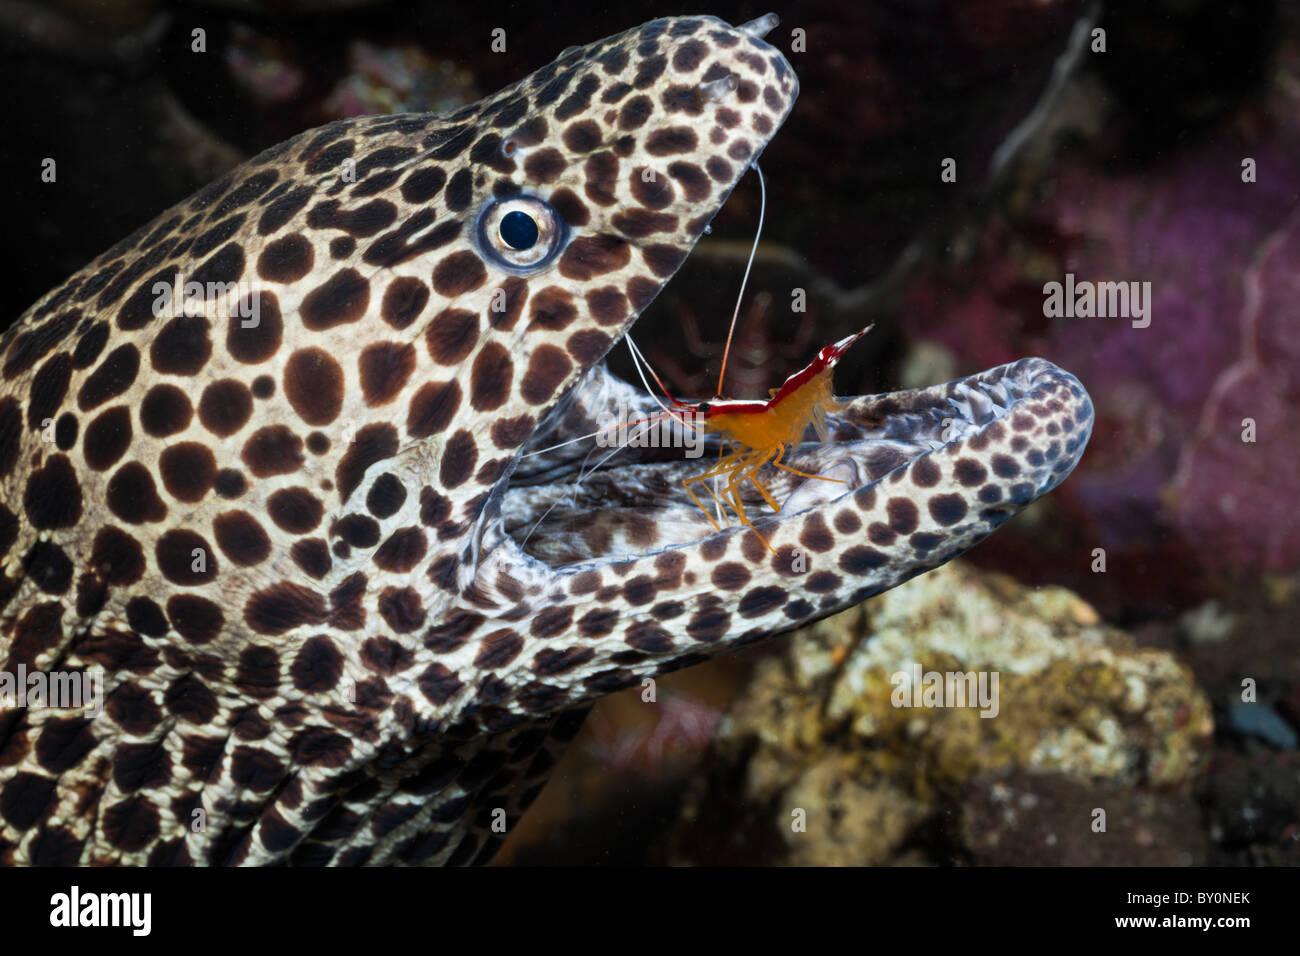 White-banded Cleaner Shrimp cleaning Honeycomb Moray, Lysmata amboinensis, Gymnothorax favagineus, Alam Batu, Bali, - Stock Image